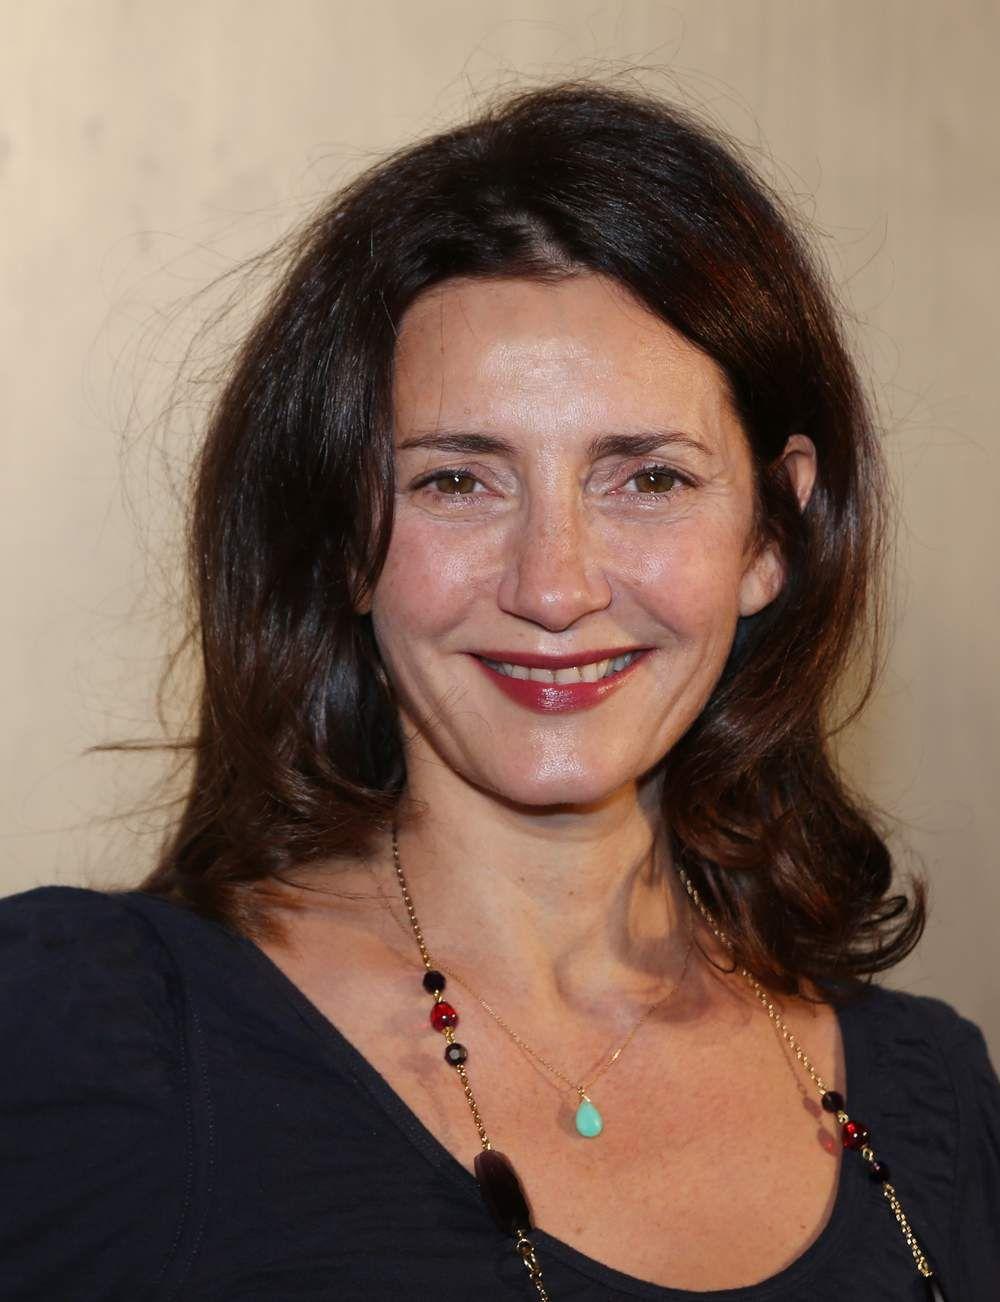 Valérie Karsenti en 2019 Valérie karsenti, Beauté et